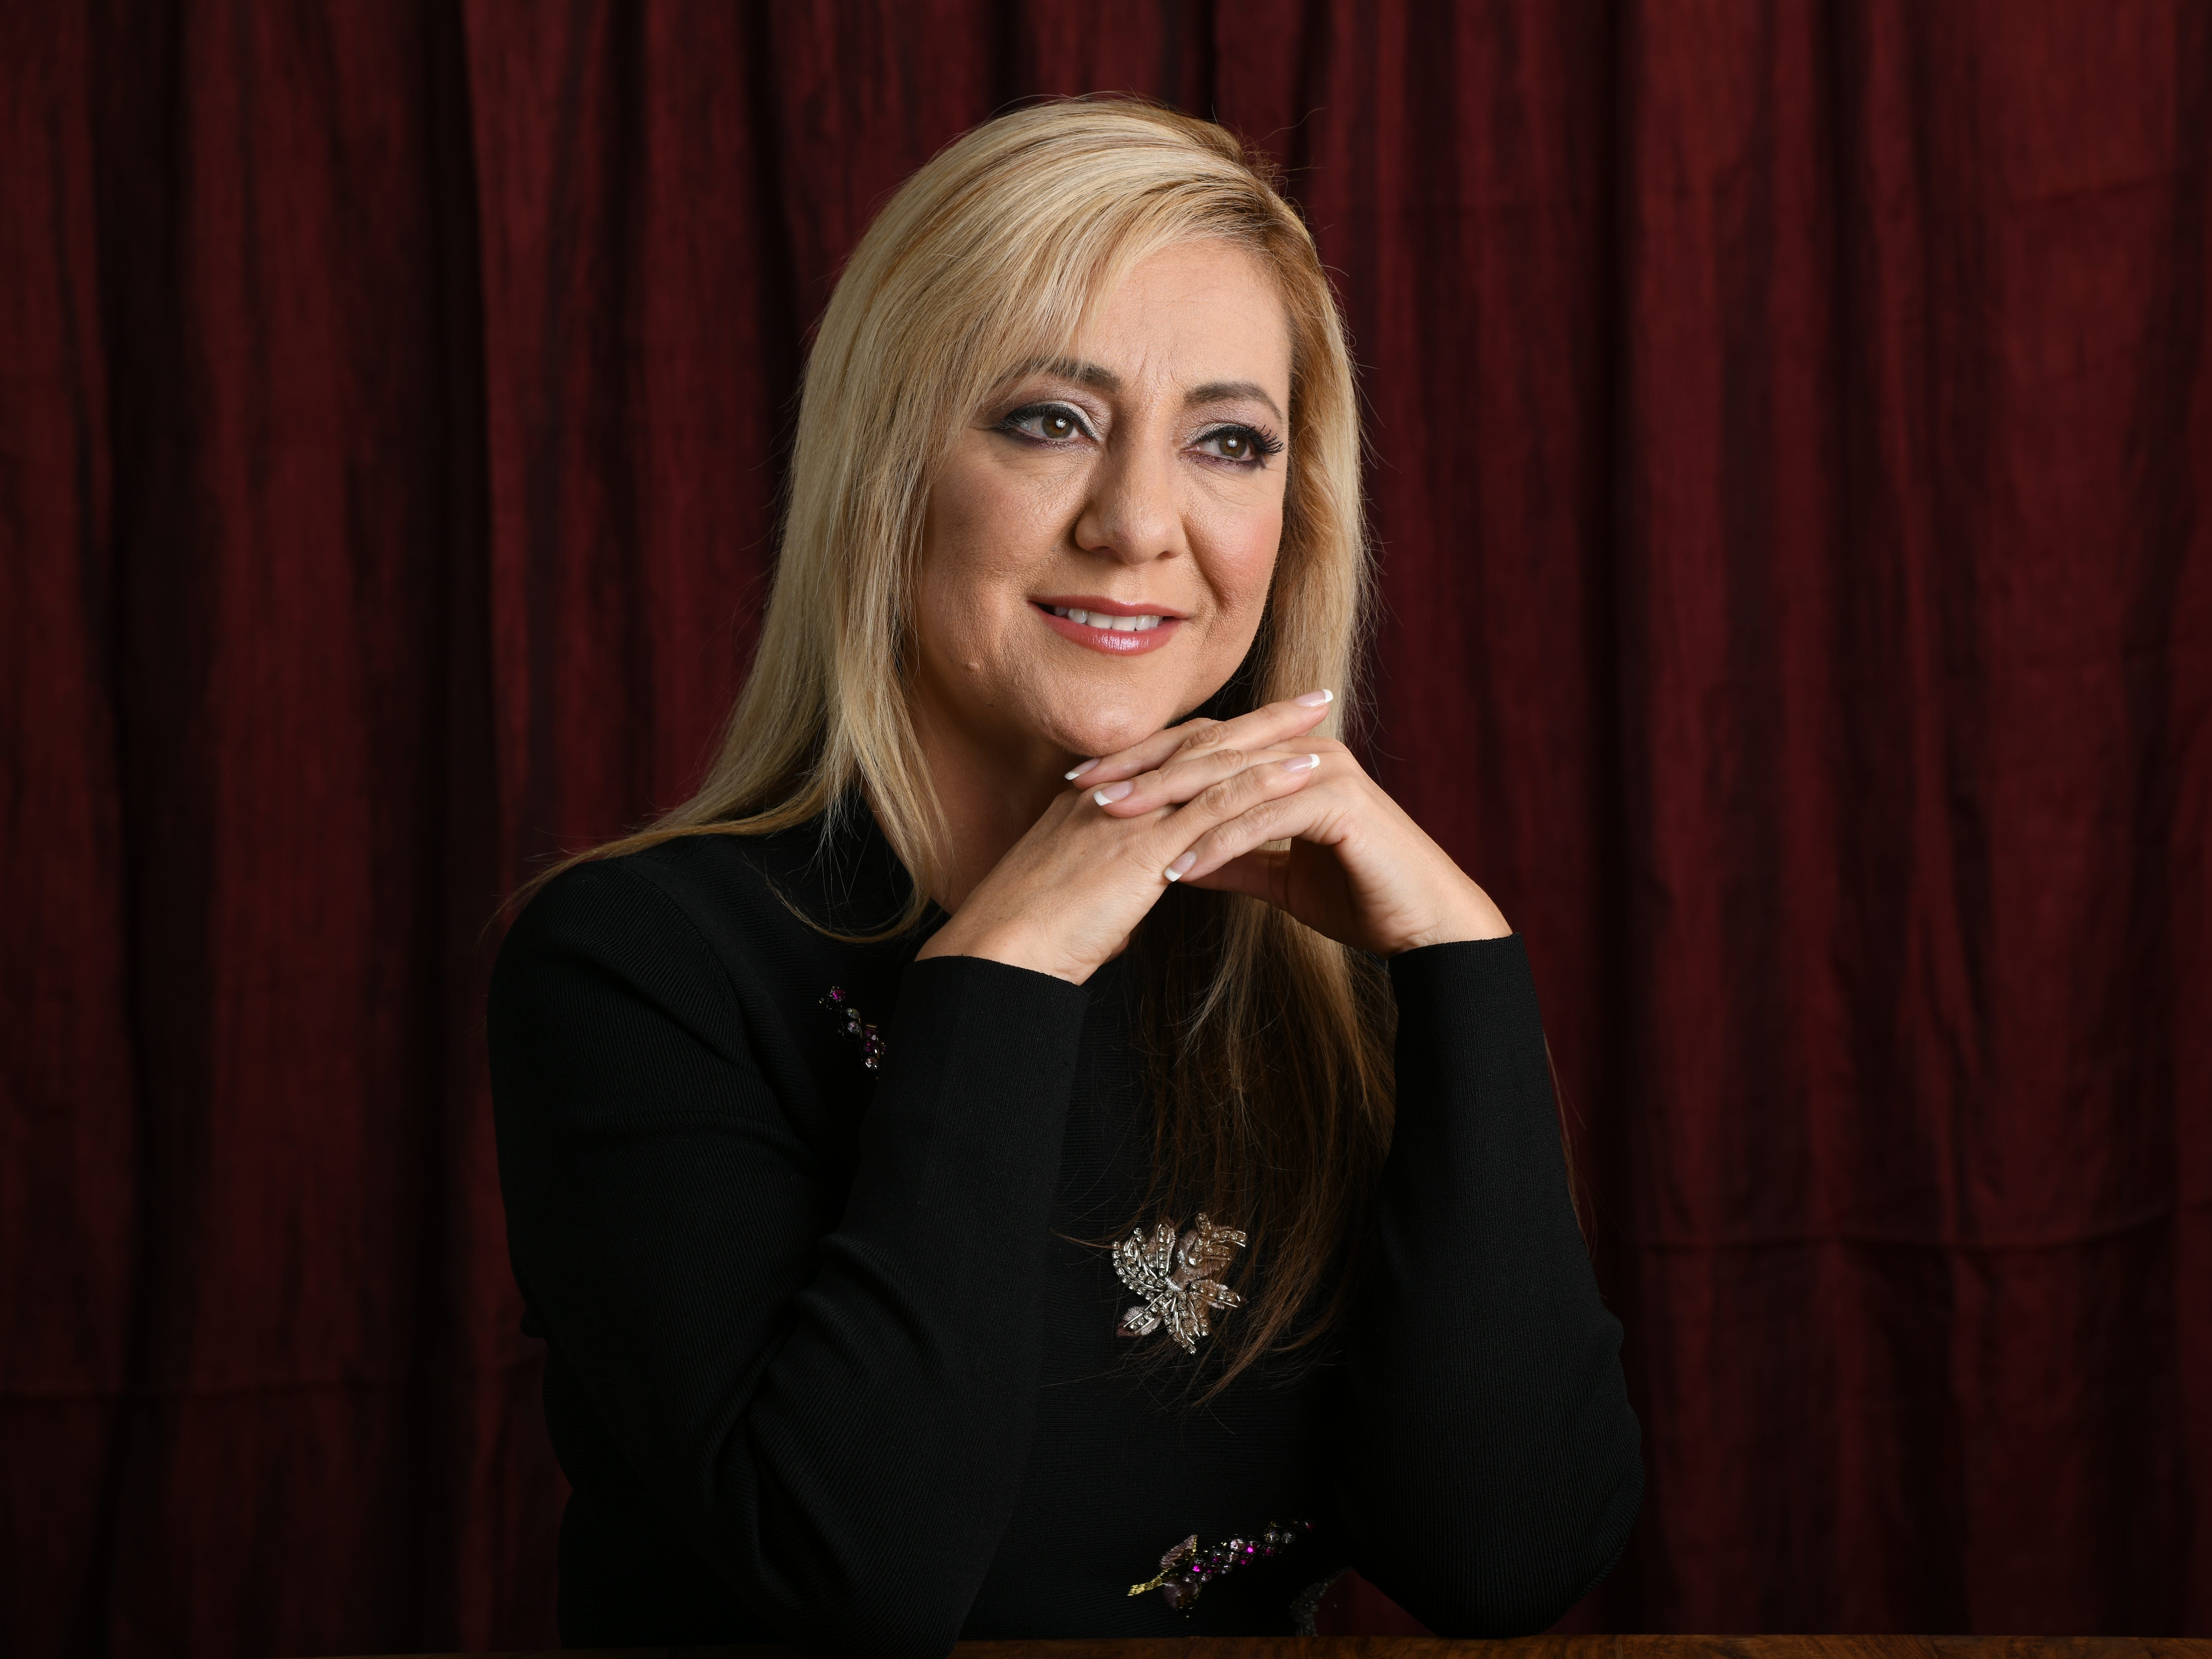 Lorena Bobbitt explains why she never remarried after slashing ex-husband's genitals